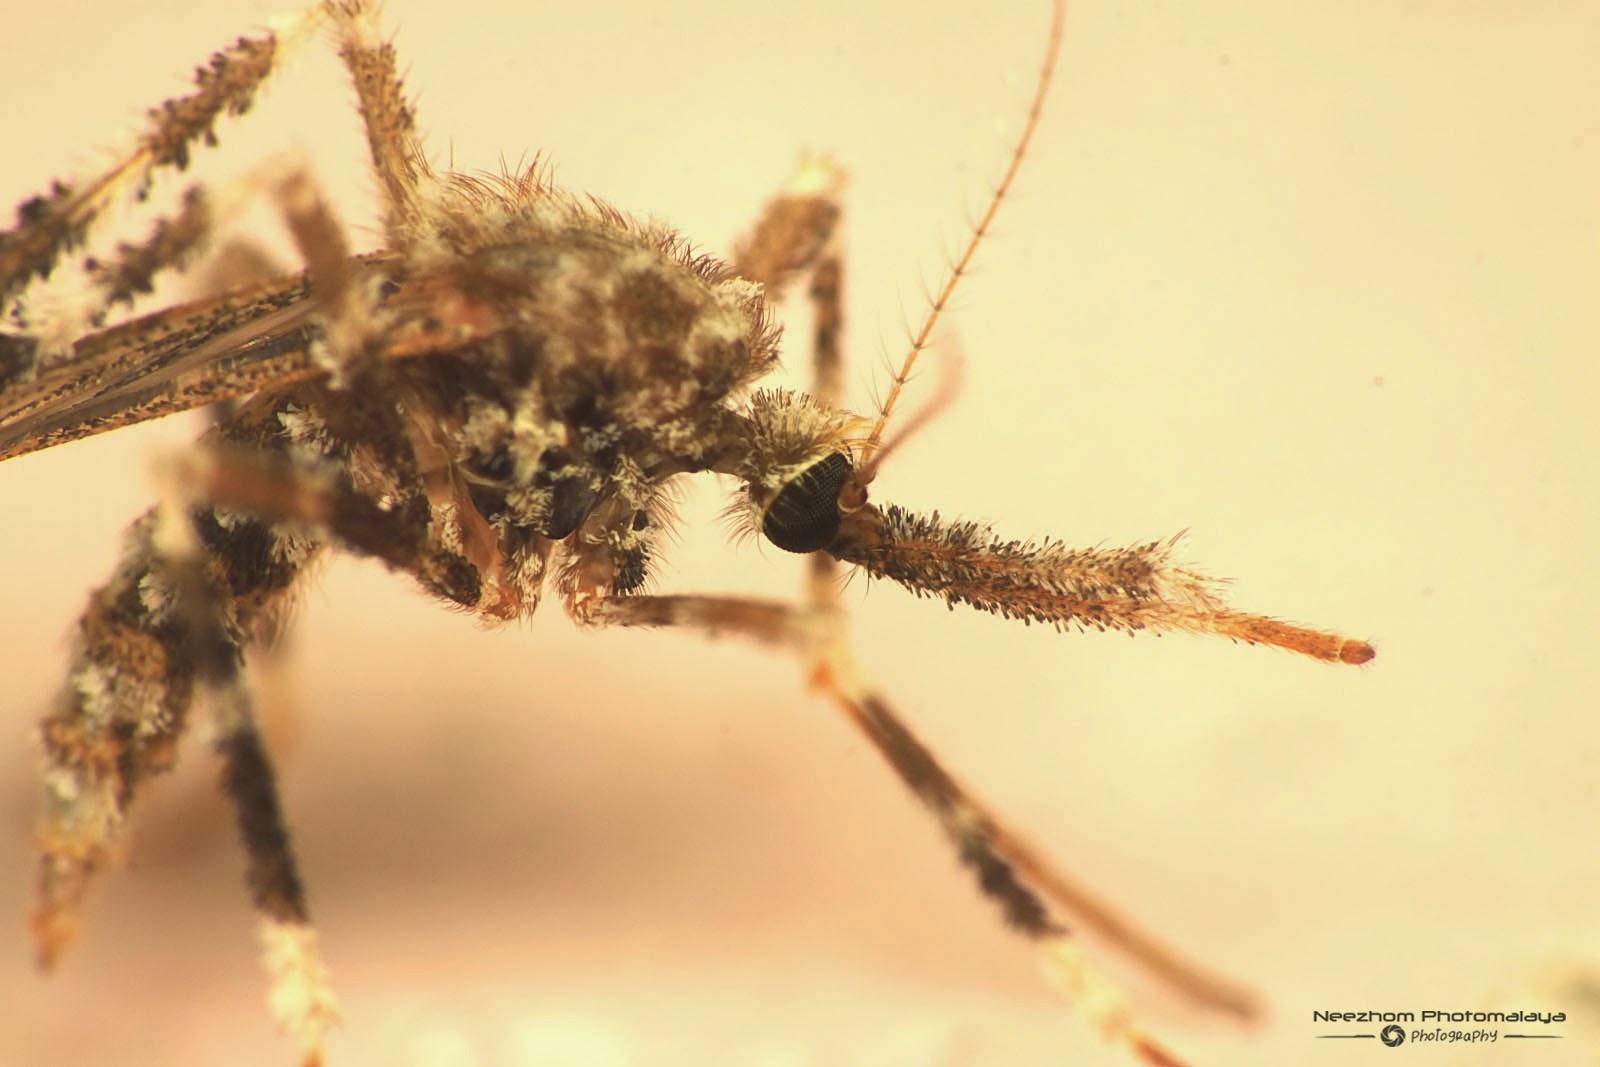 Bush mosquito species